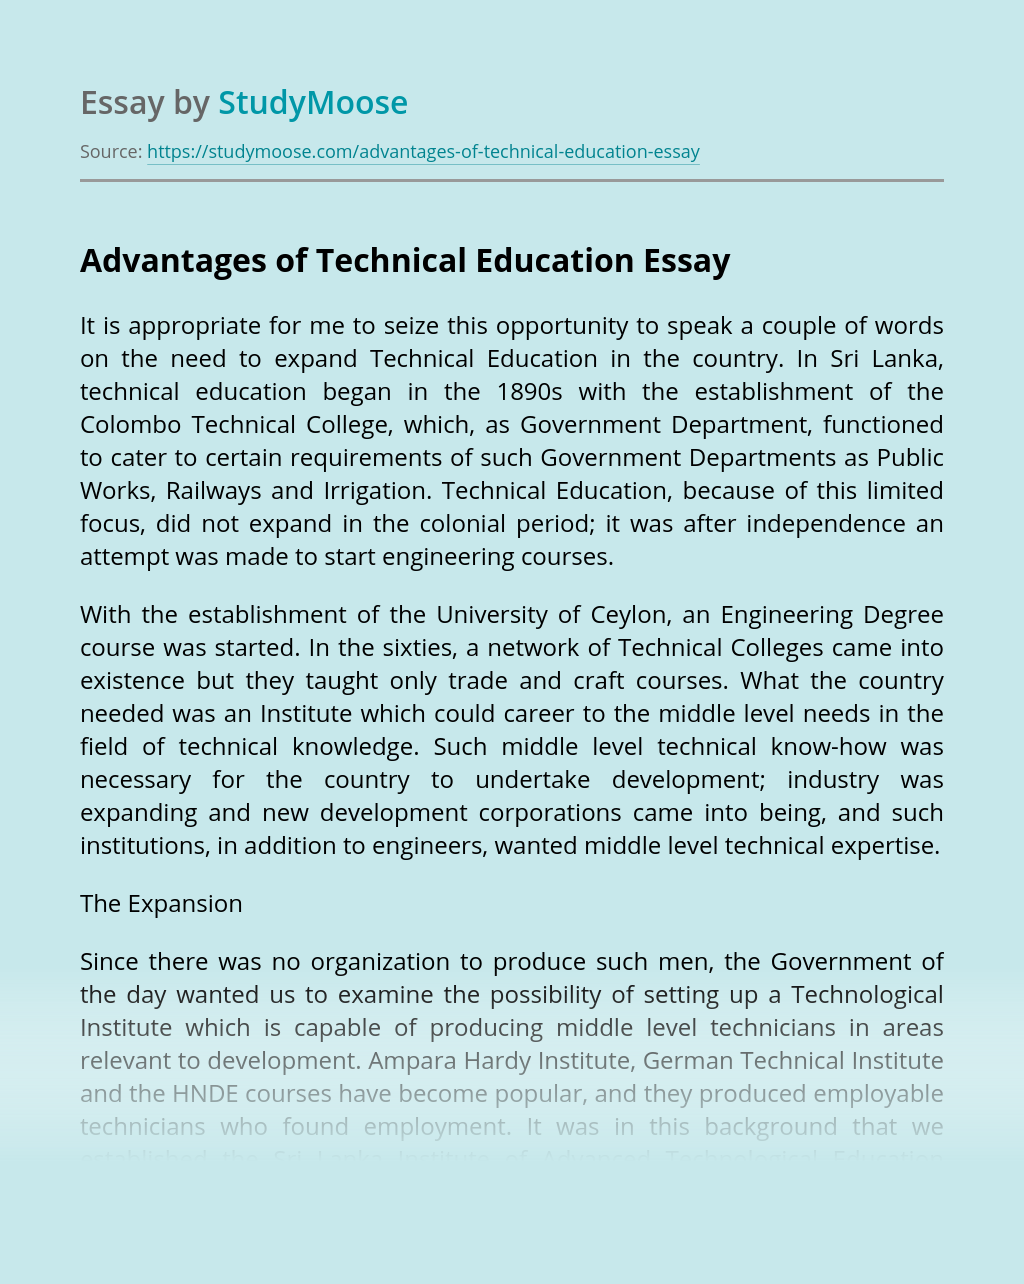 Advantages of Technical Education